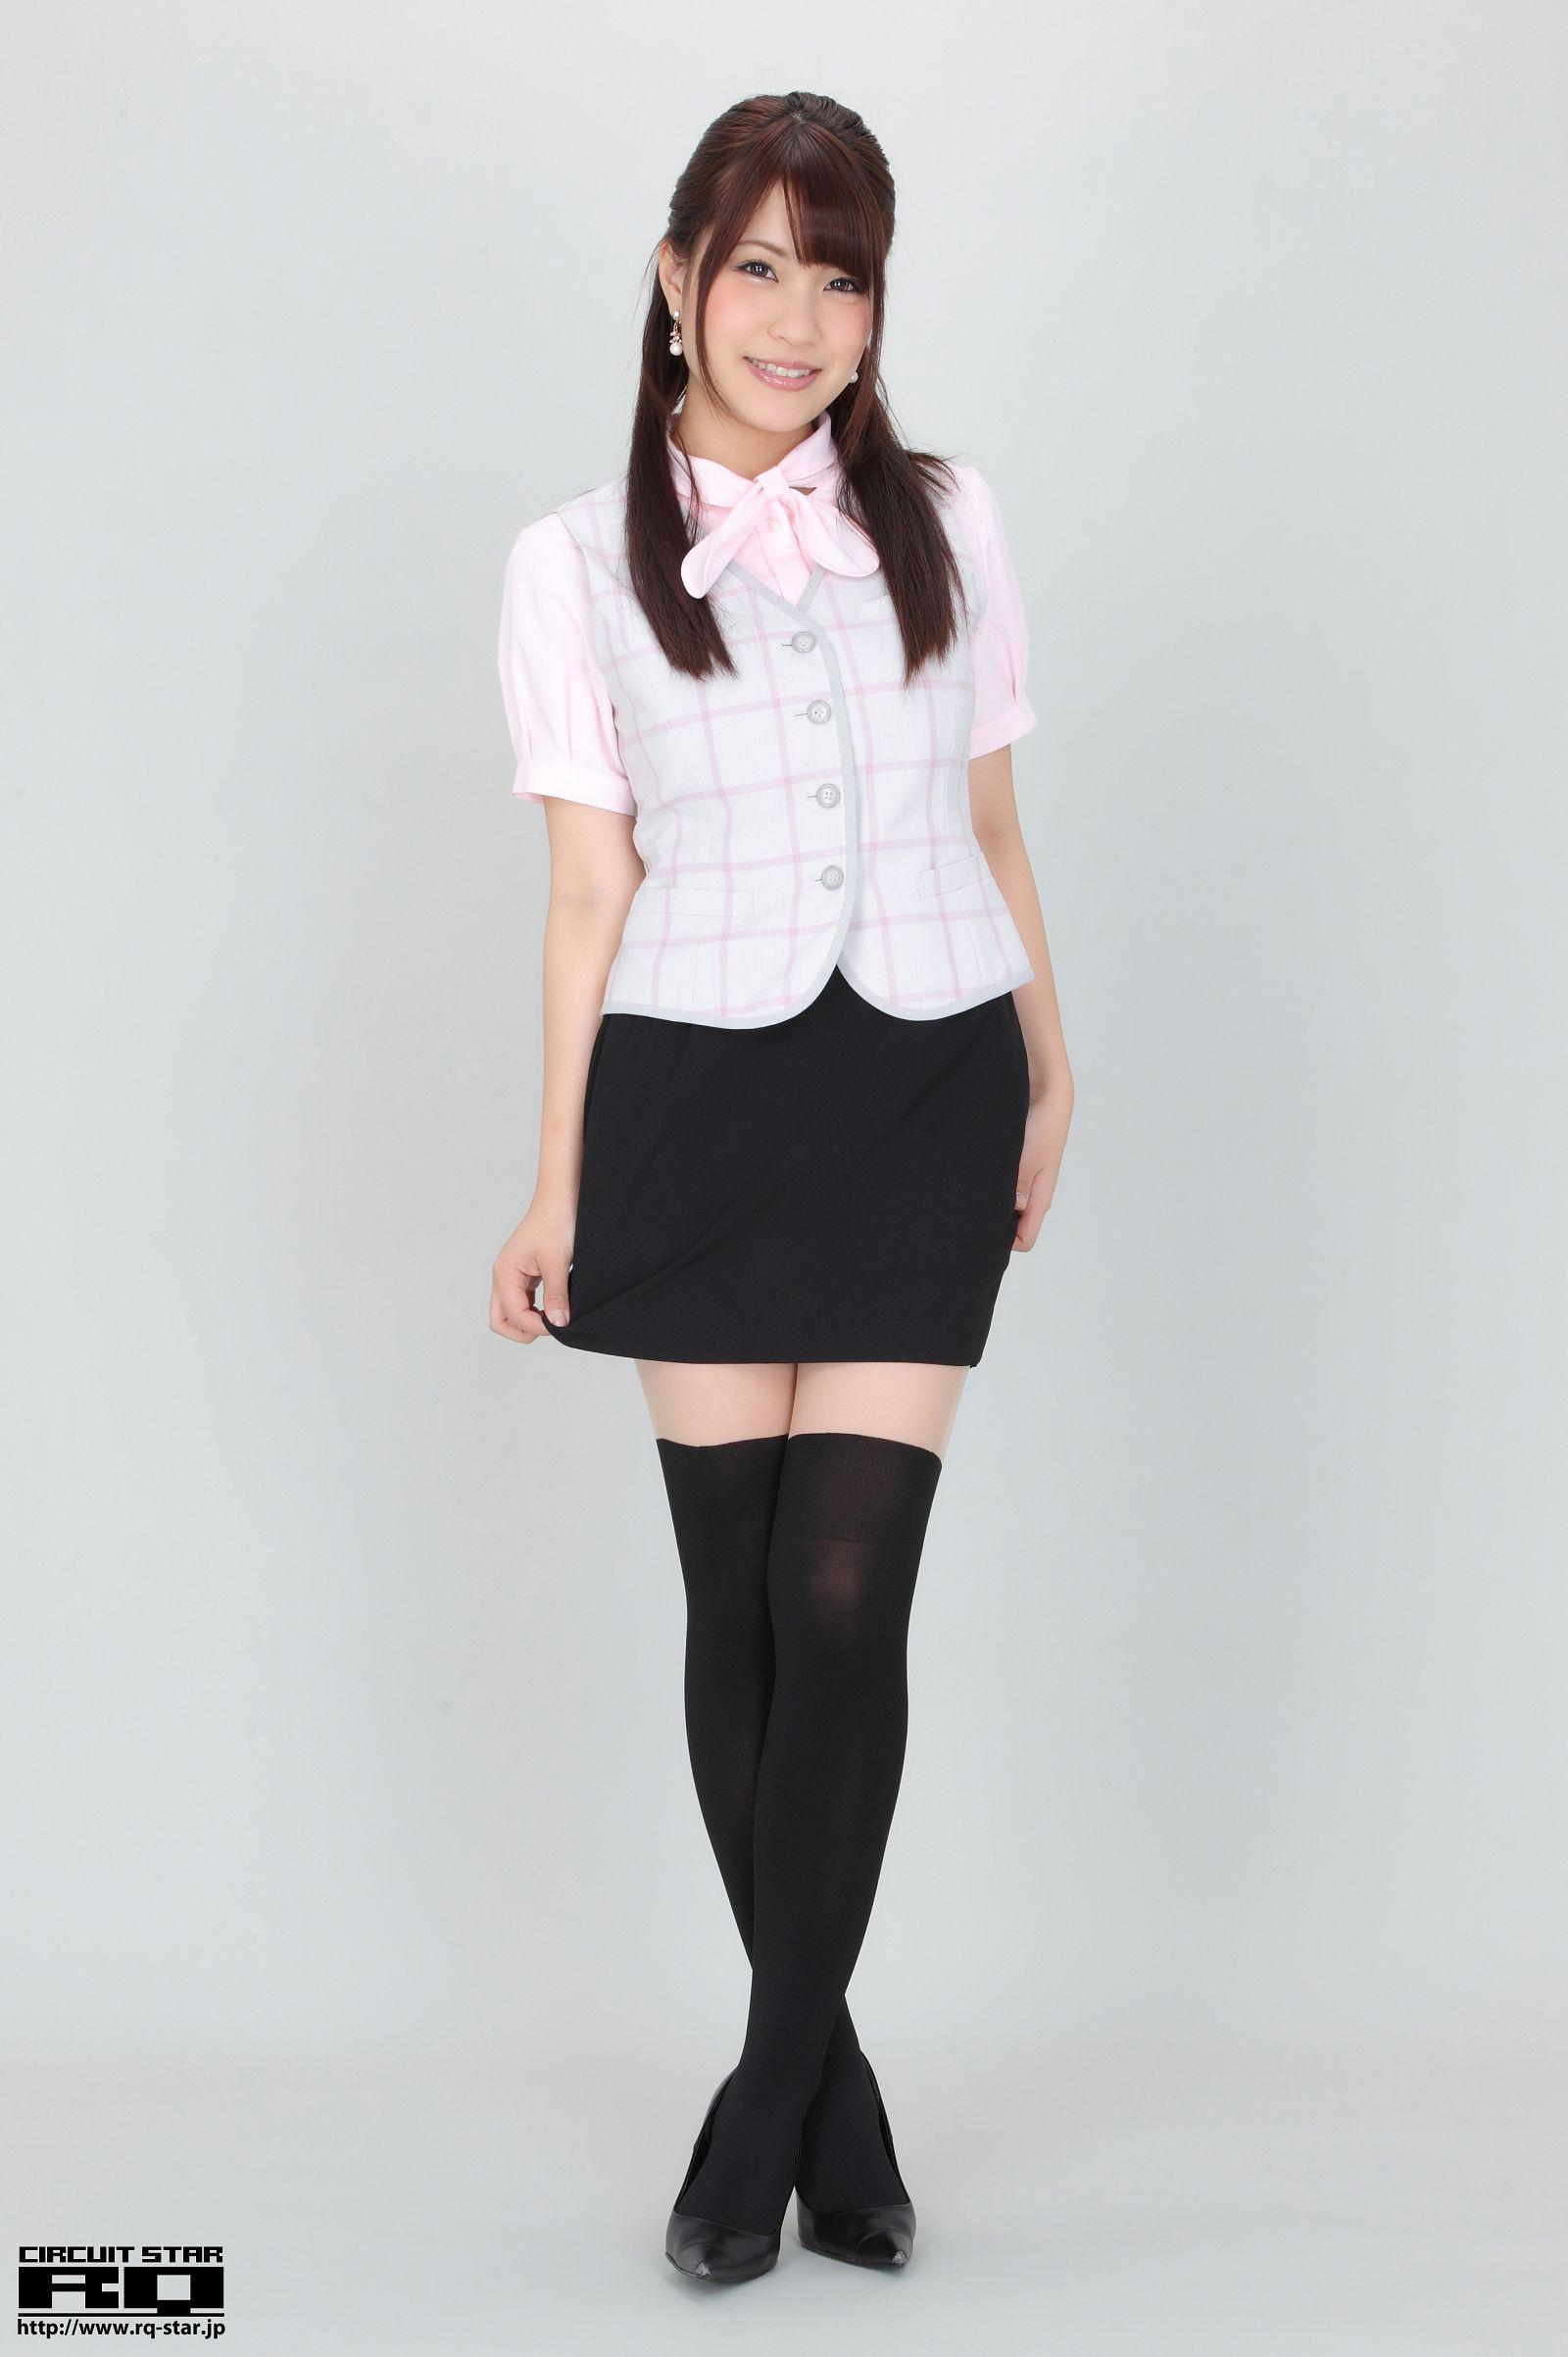 [RQ STAR美女] NO.00606 Asuka Yuzaki 柚崎明日香 Office Lady[100P] RQ STAR 第1张